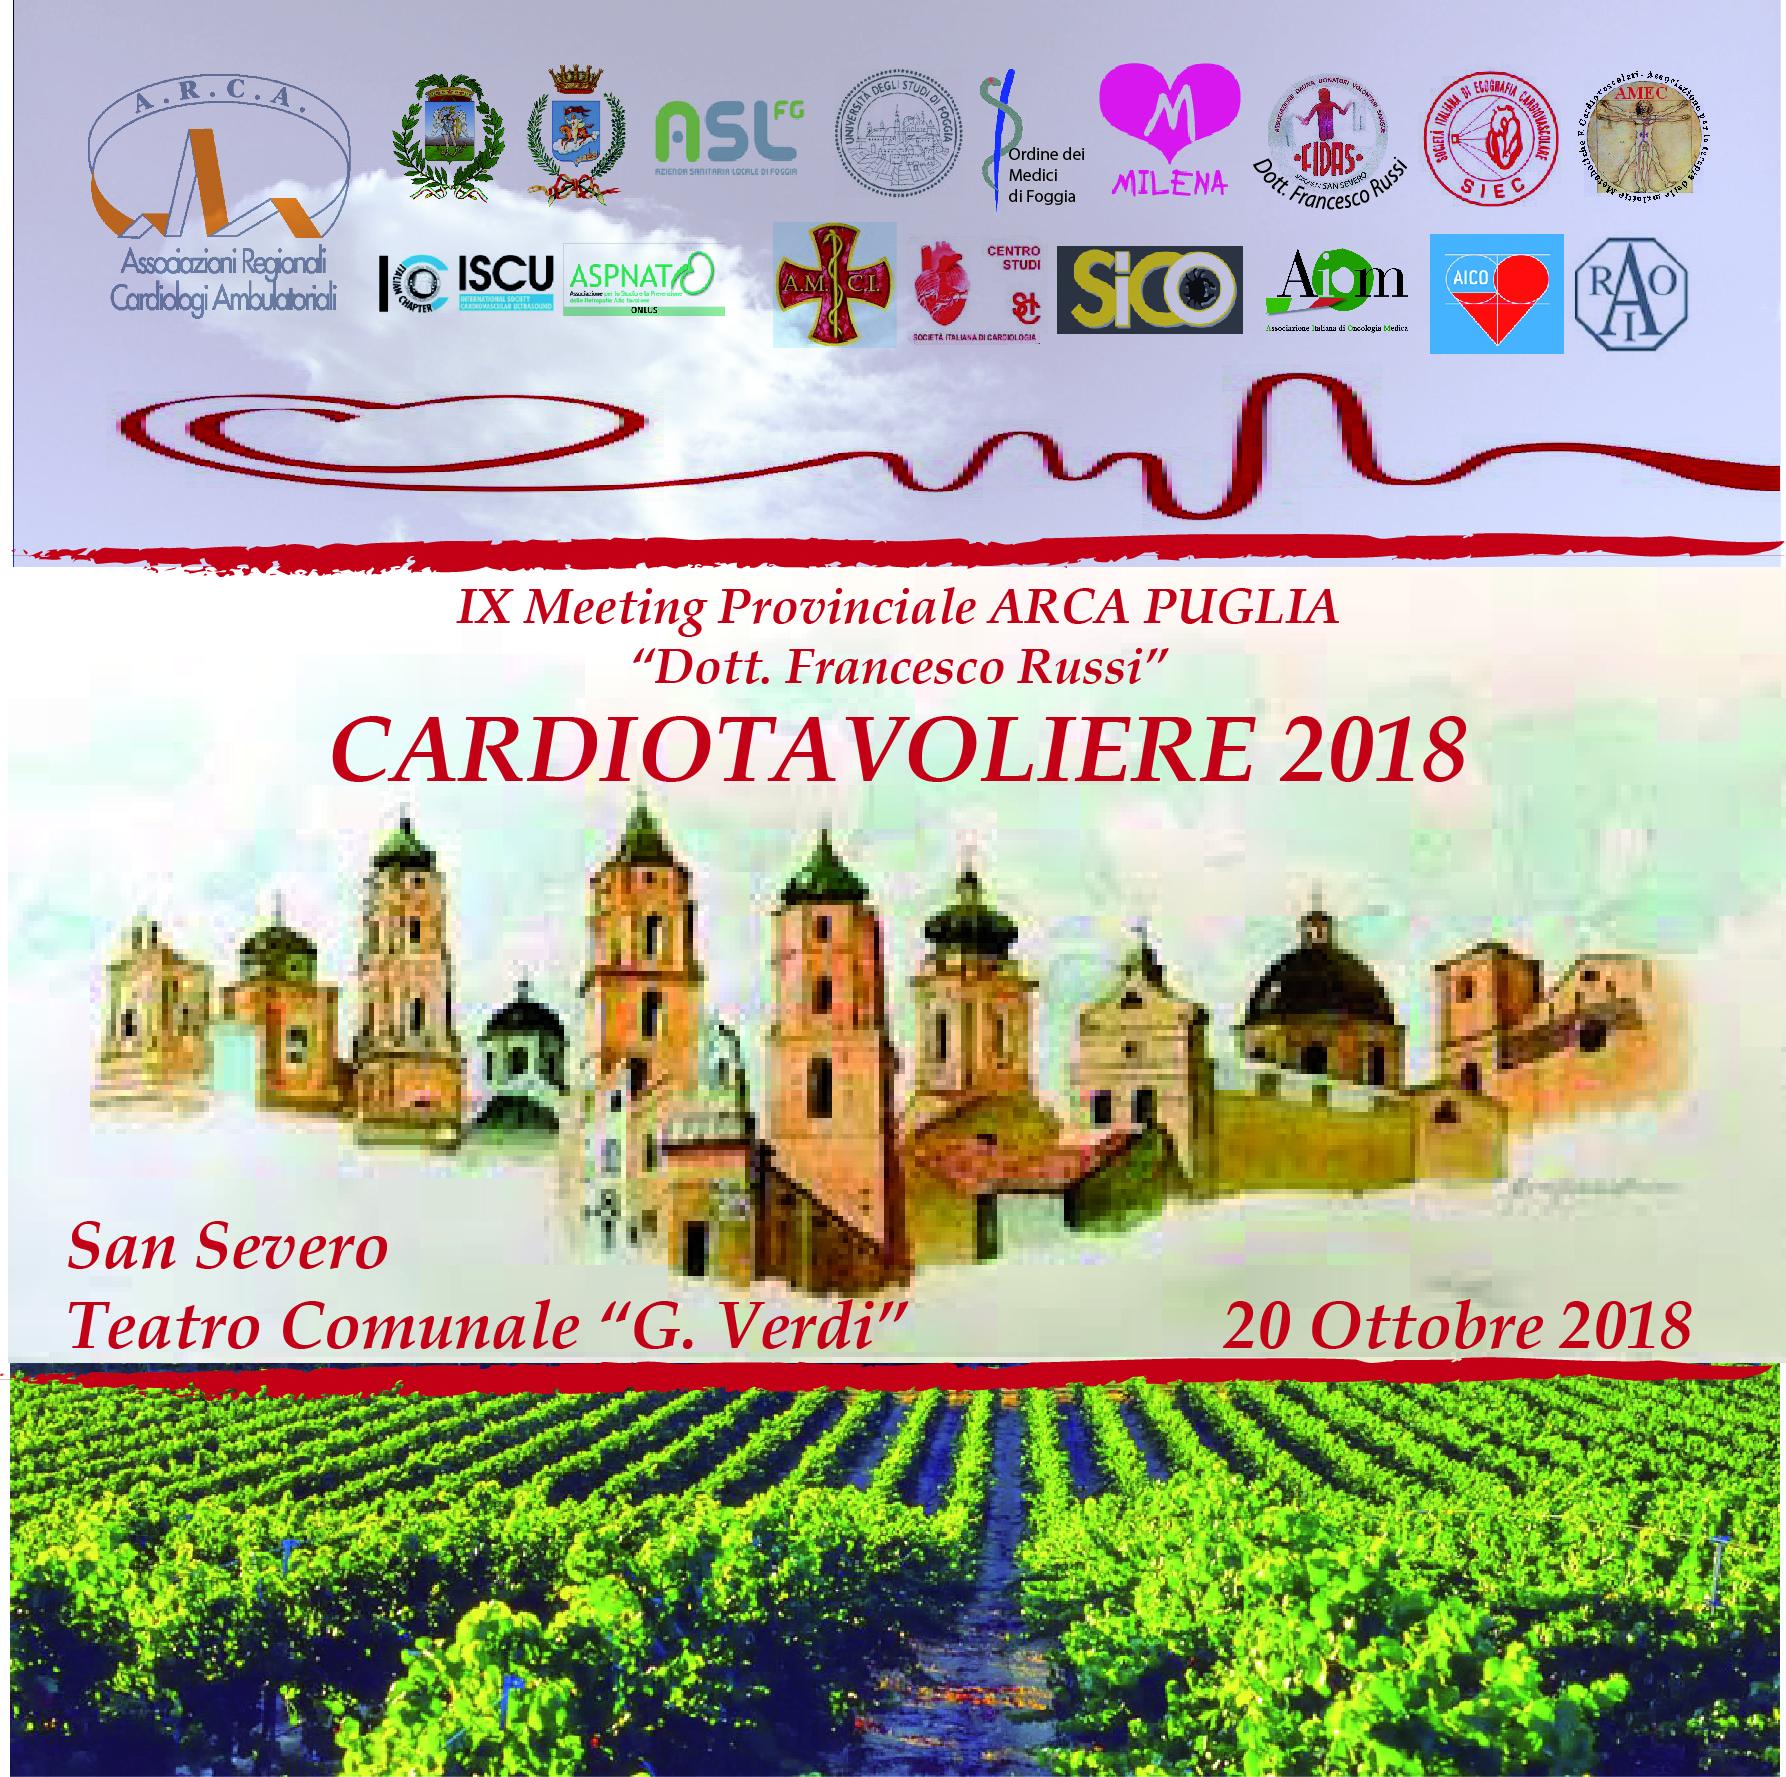 IX MEETING PROVINCIALE ARCA PUGLIA - CARDIOTAVOLIERE 2018